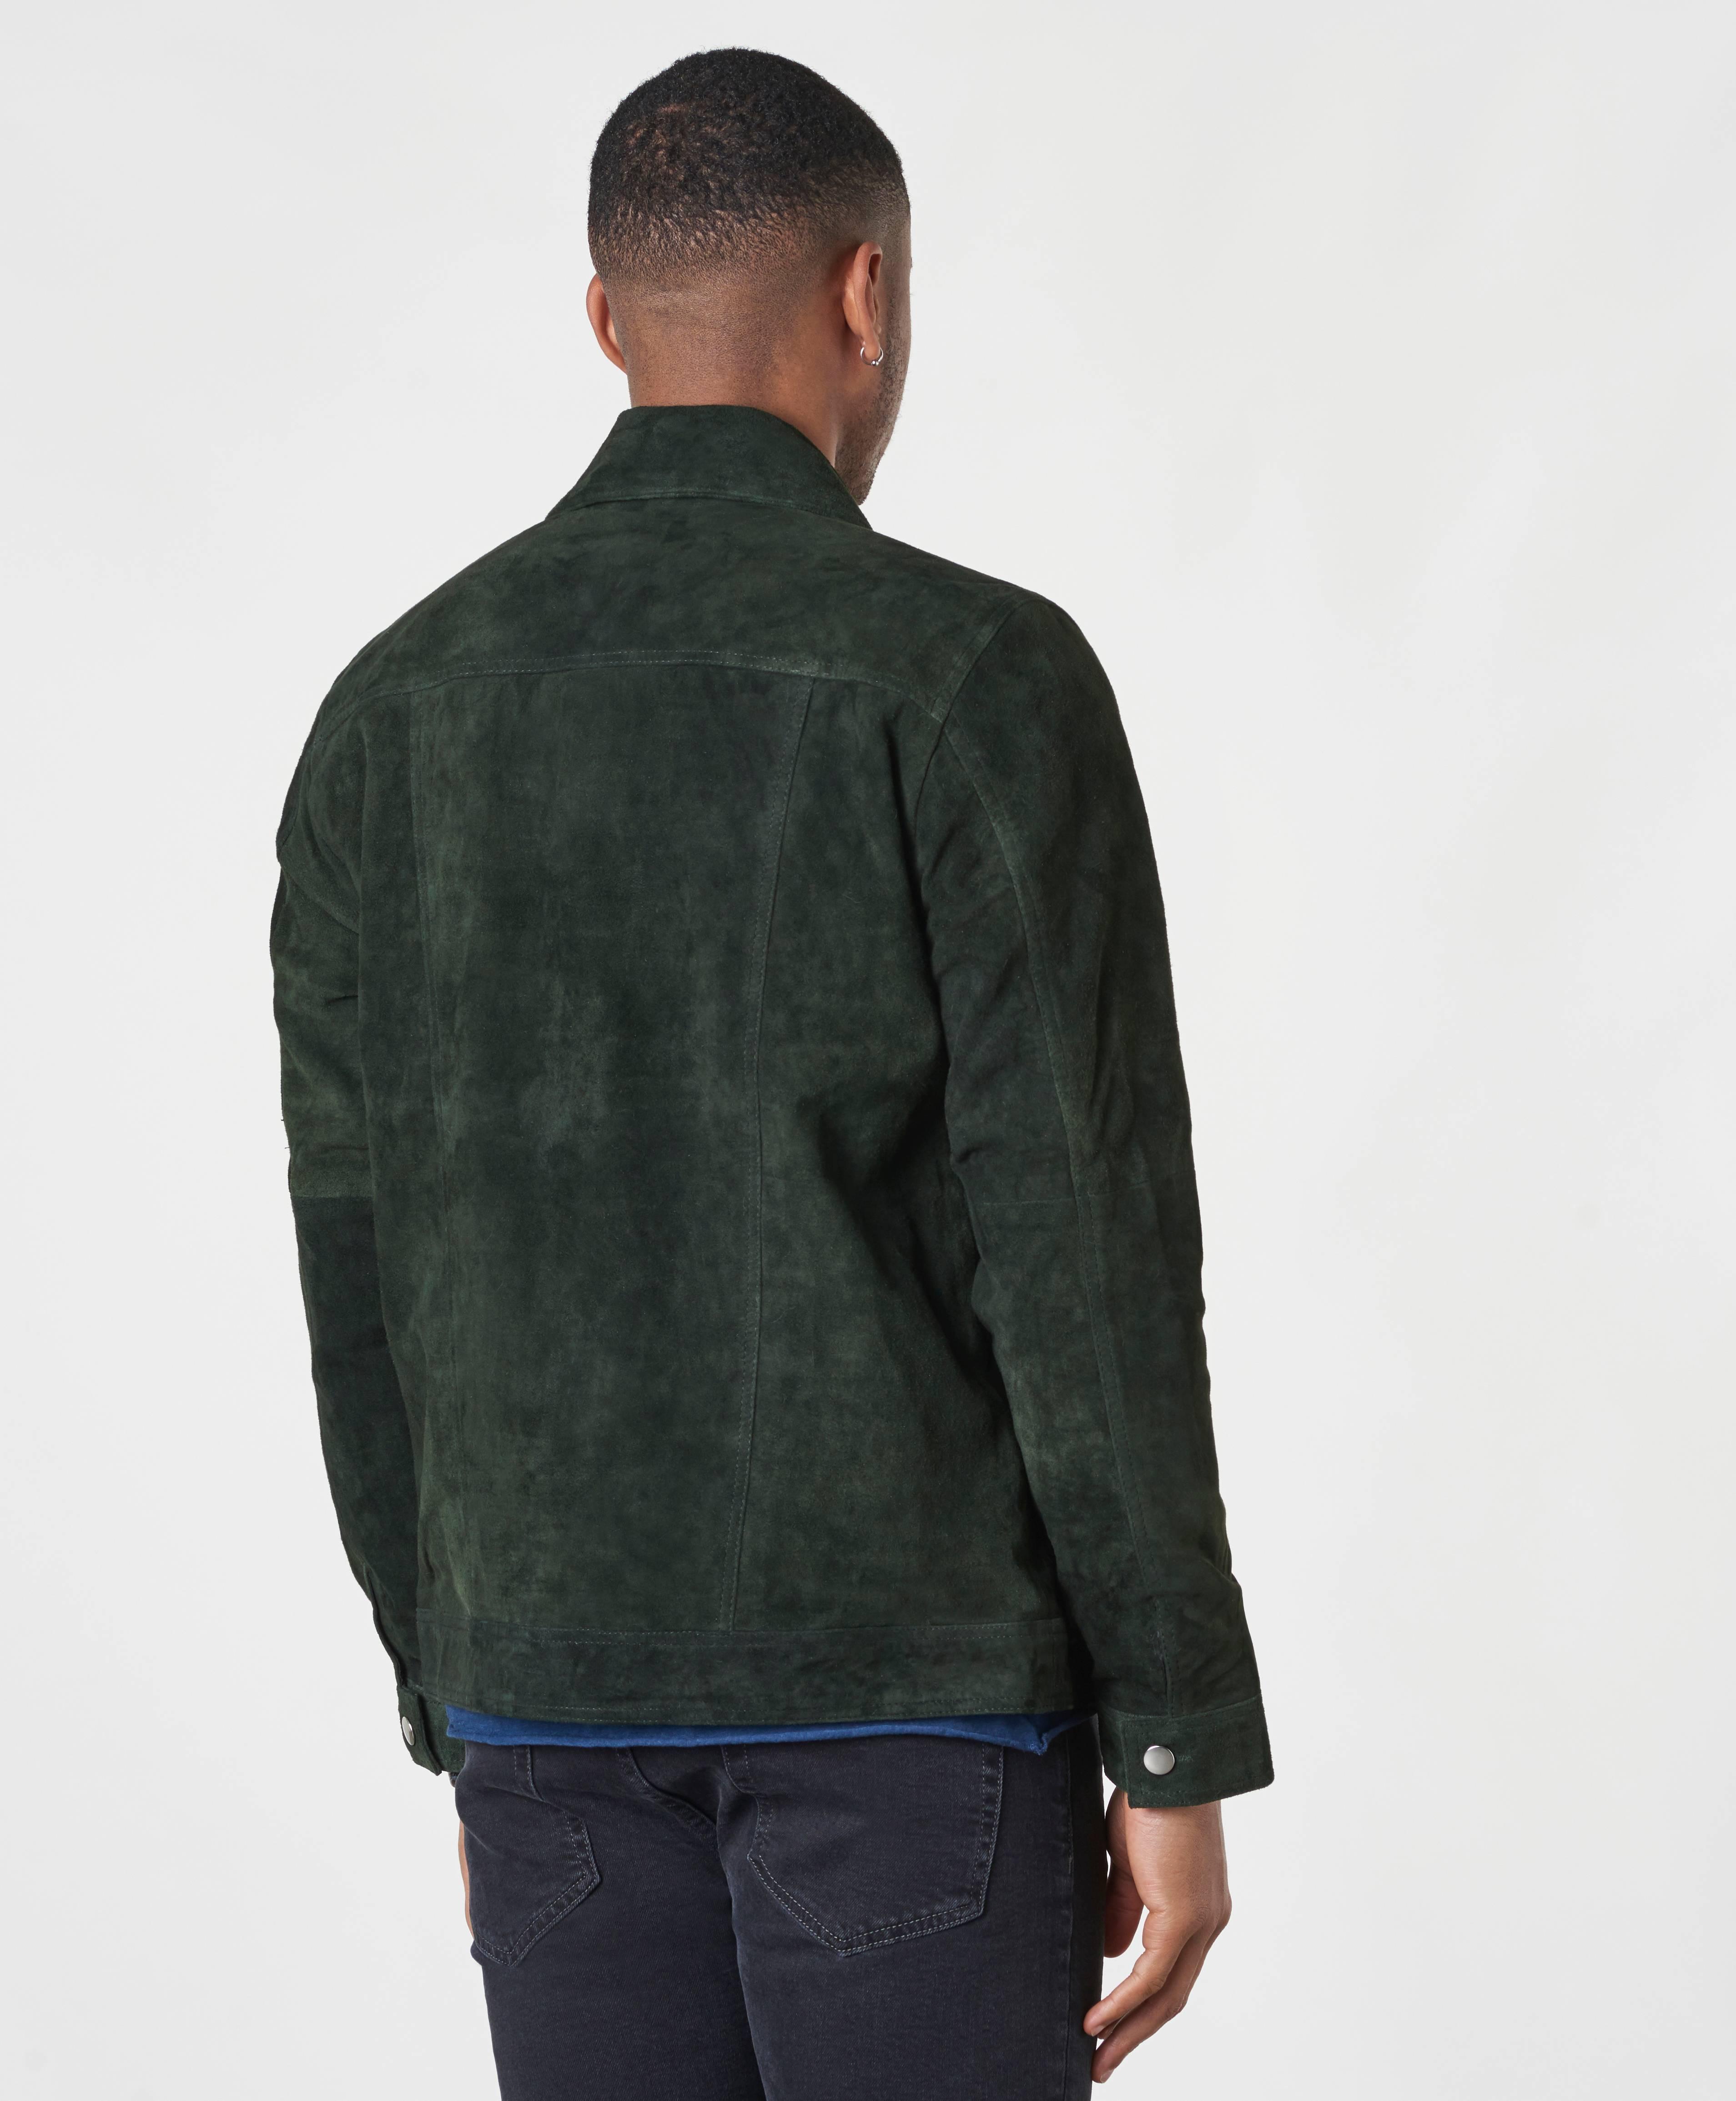 William Strouch Jakke Suede Jacket Grøn Tøj Stayhard.dk